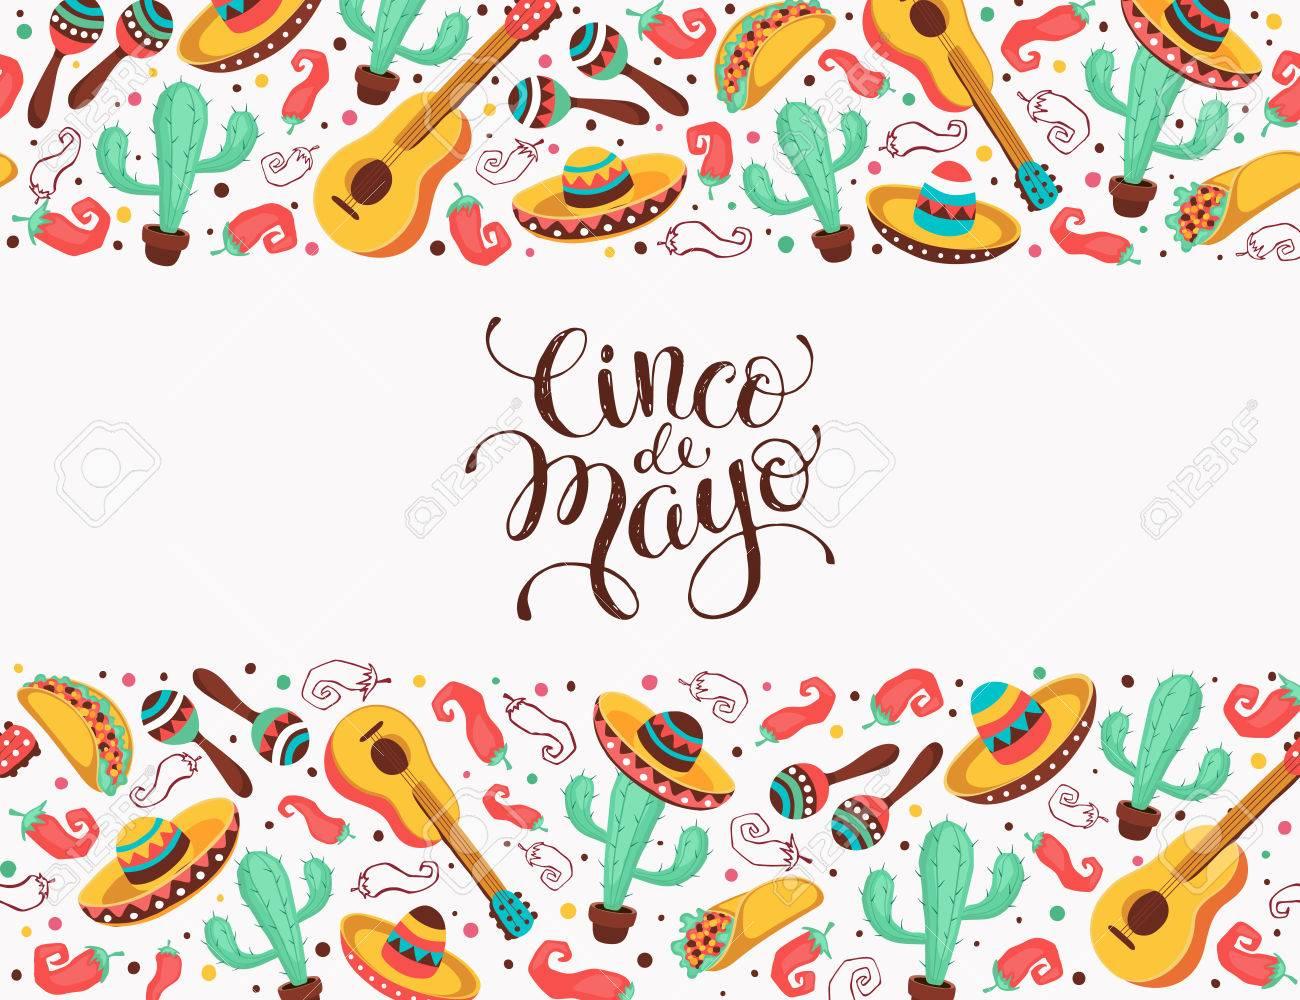 Cinco De Mayo Poster In Horizontal Stripe Composition Mexican Culture Symbols Collection Guitar